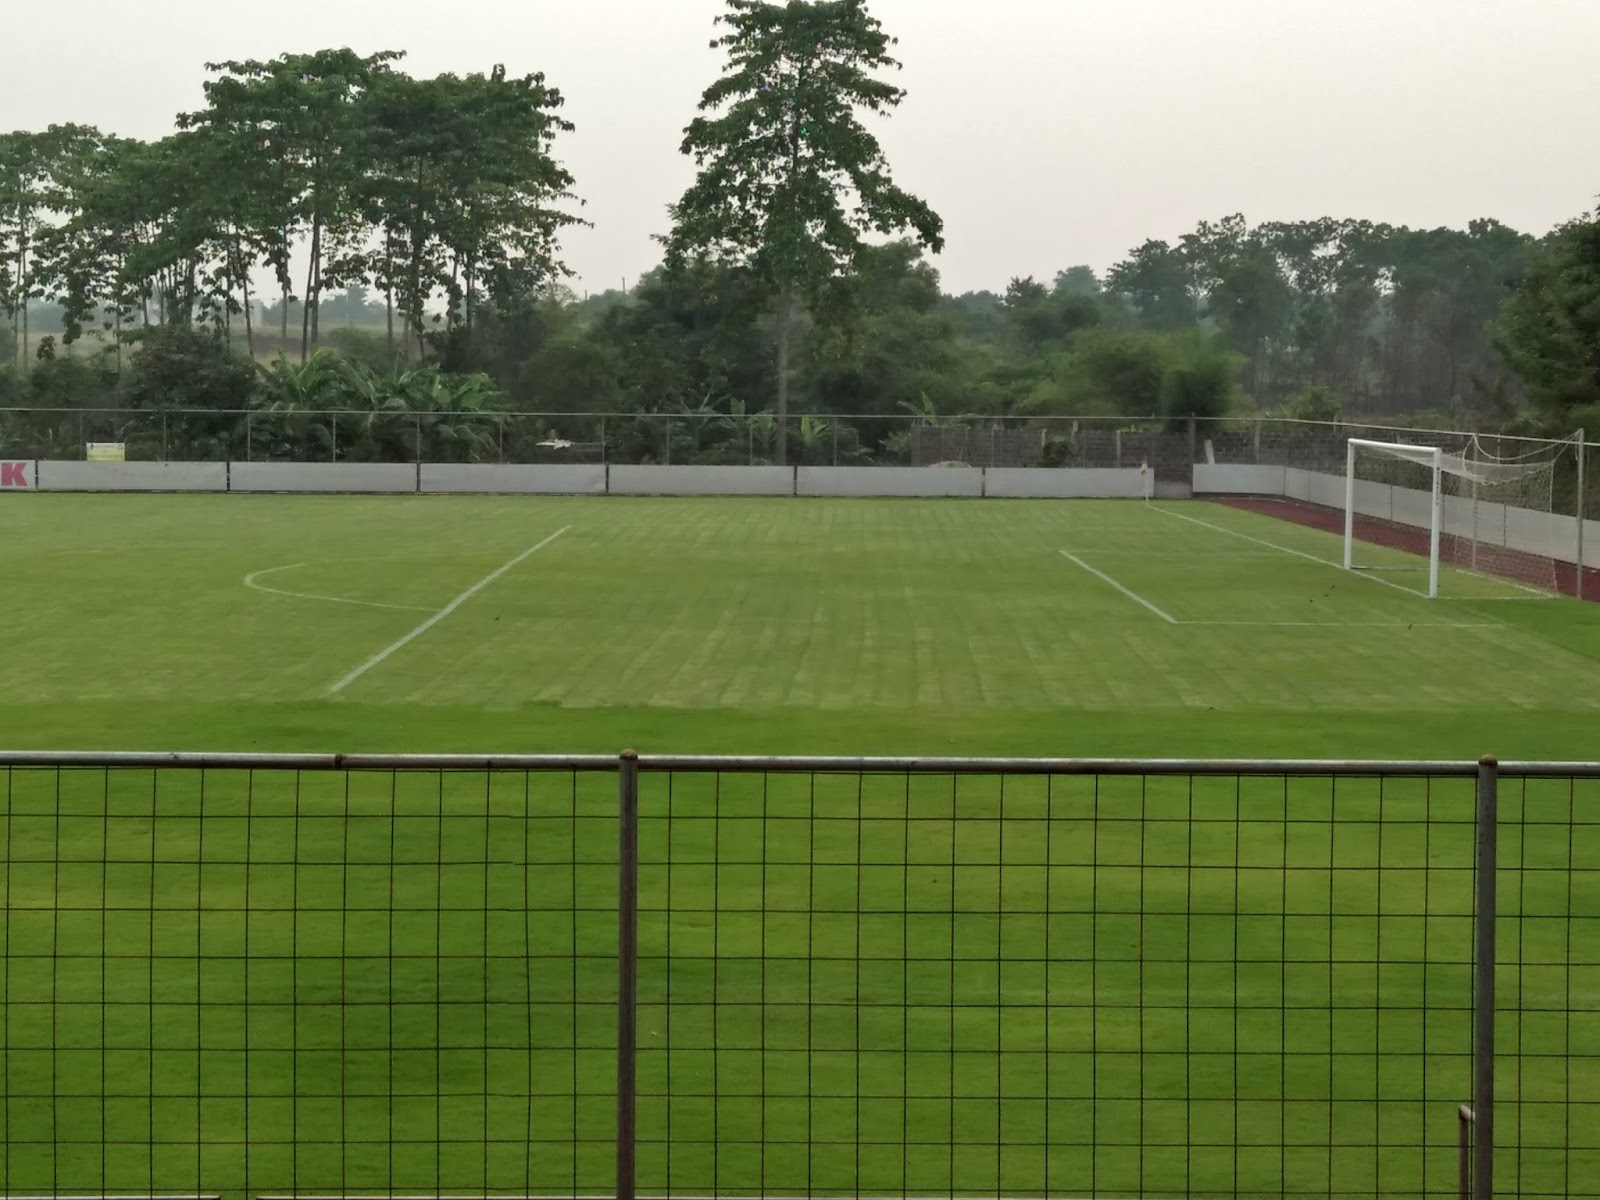 Jual Bibit Rumput Lapangan Sepak Bola Internasional Agen Biji Tanaman Hias Kami Adalah Supplier Berbagai Macam Atau Benih Rumputsalah Satunya Untuk